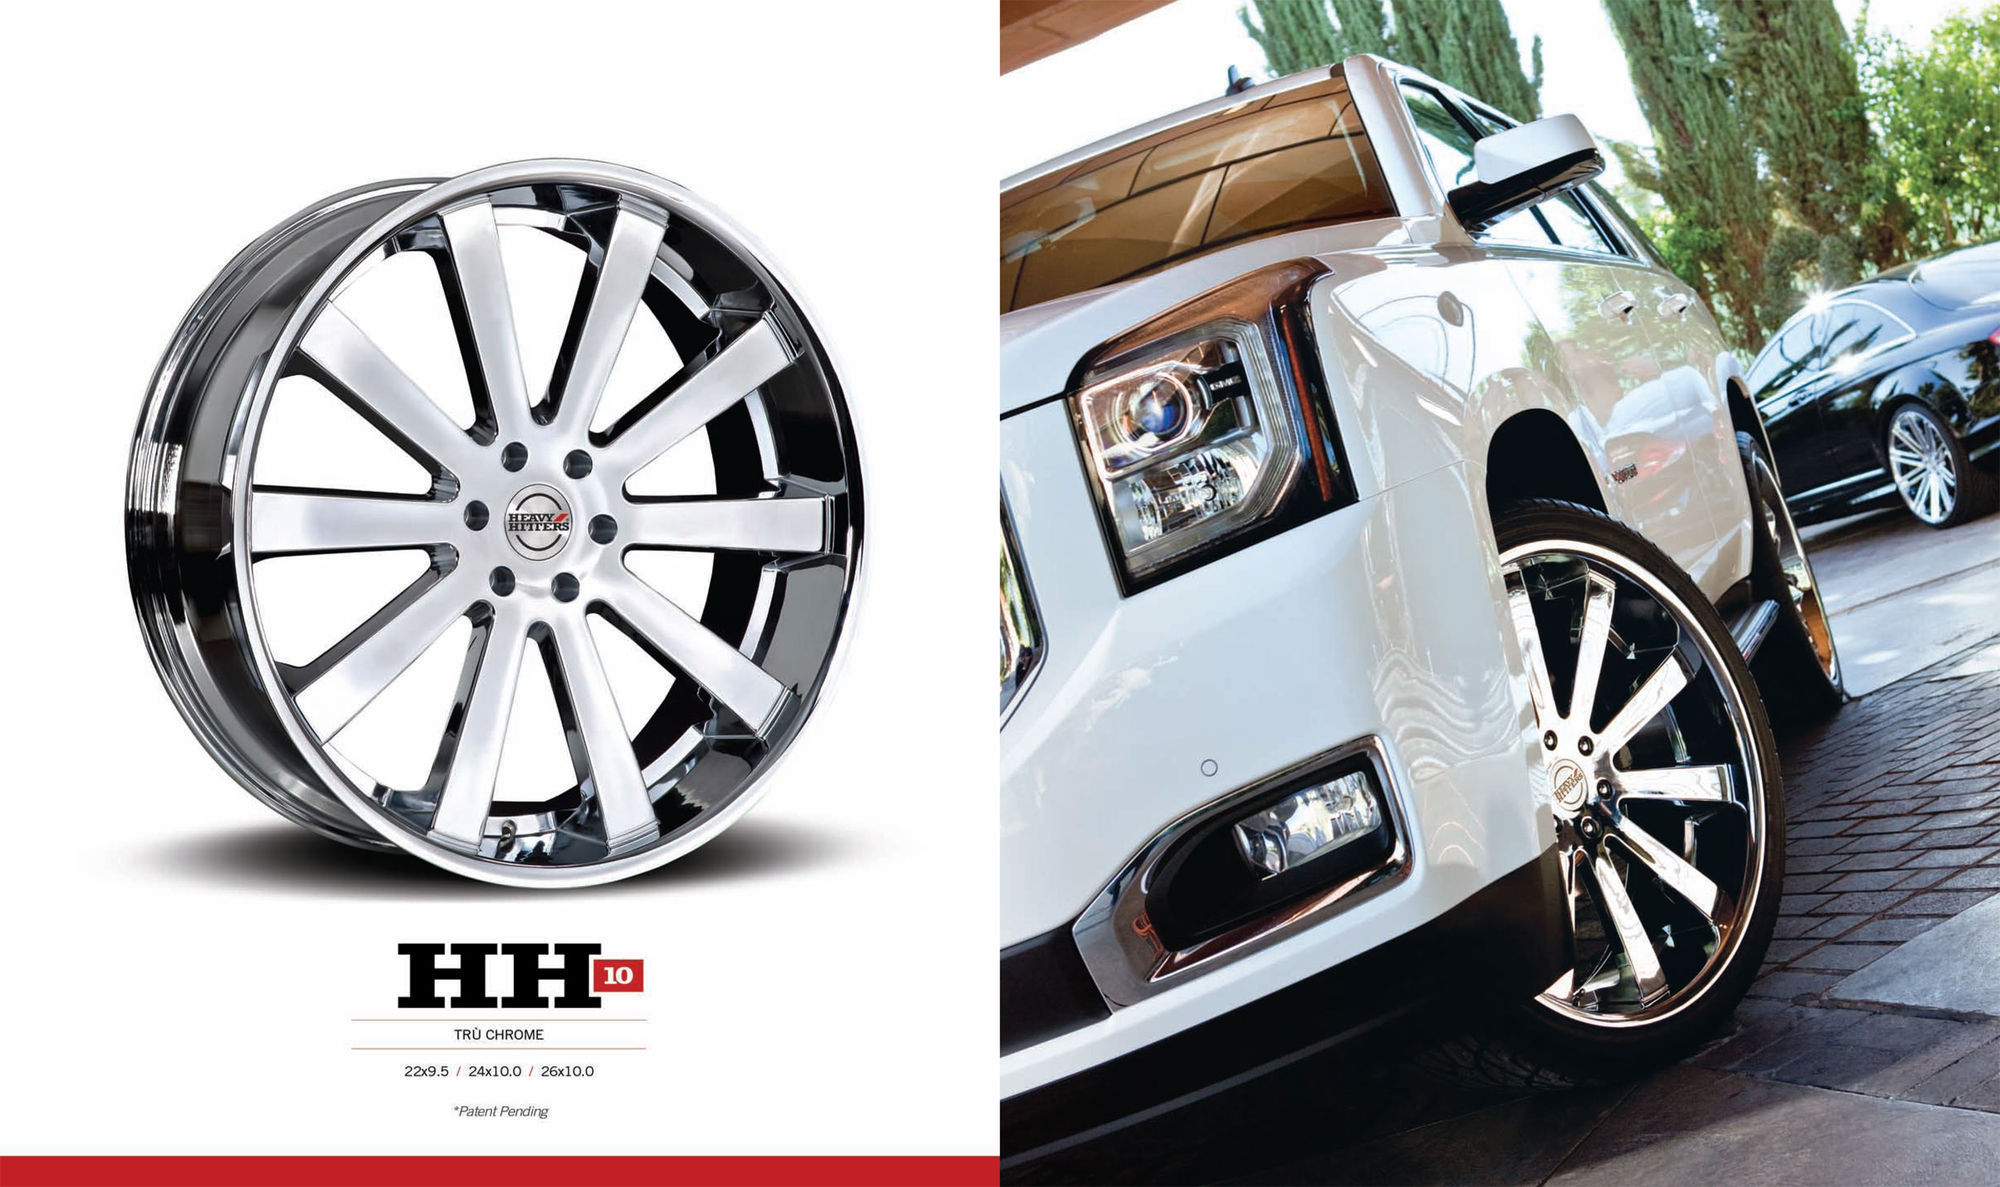 2014 GMC Yukon | HH10